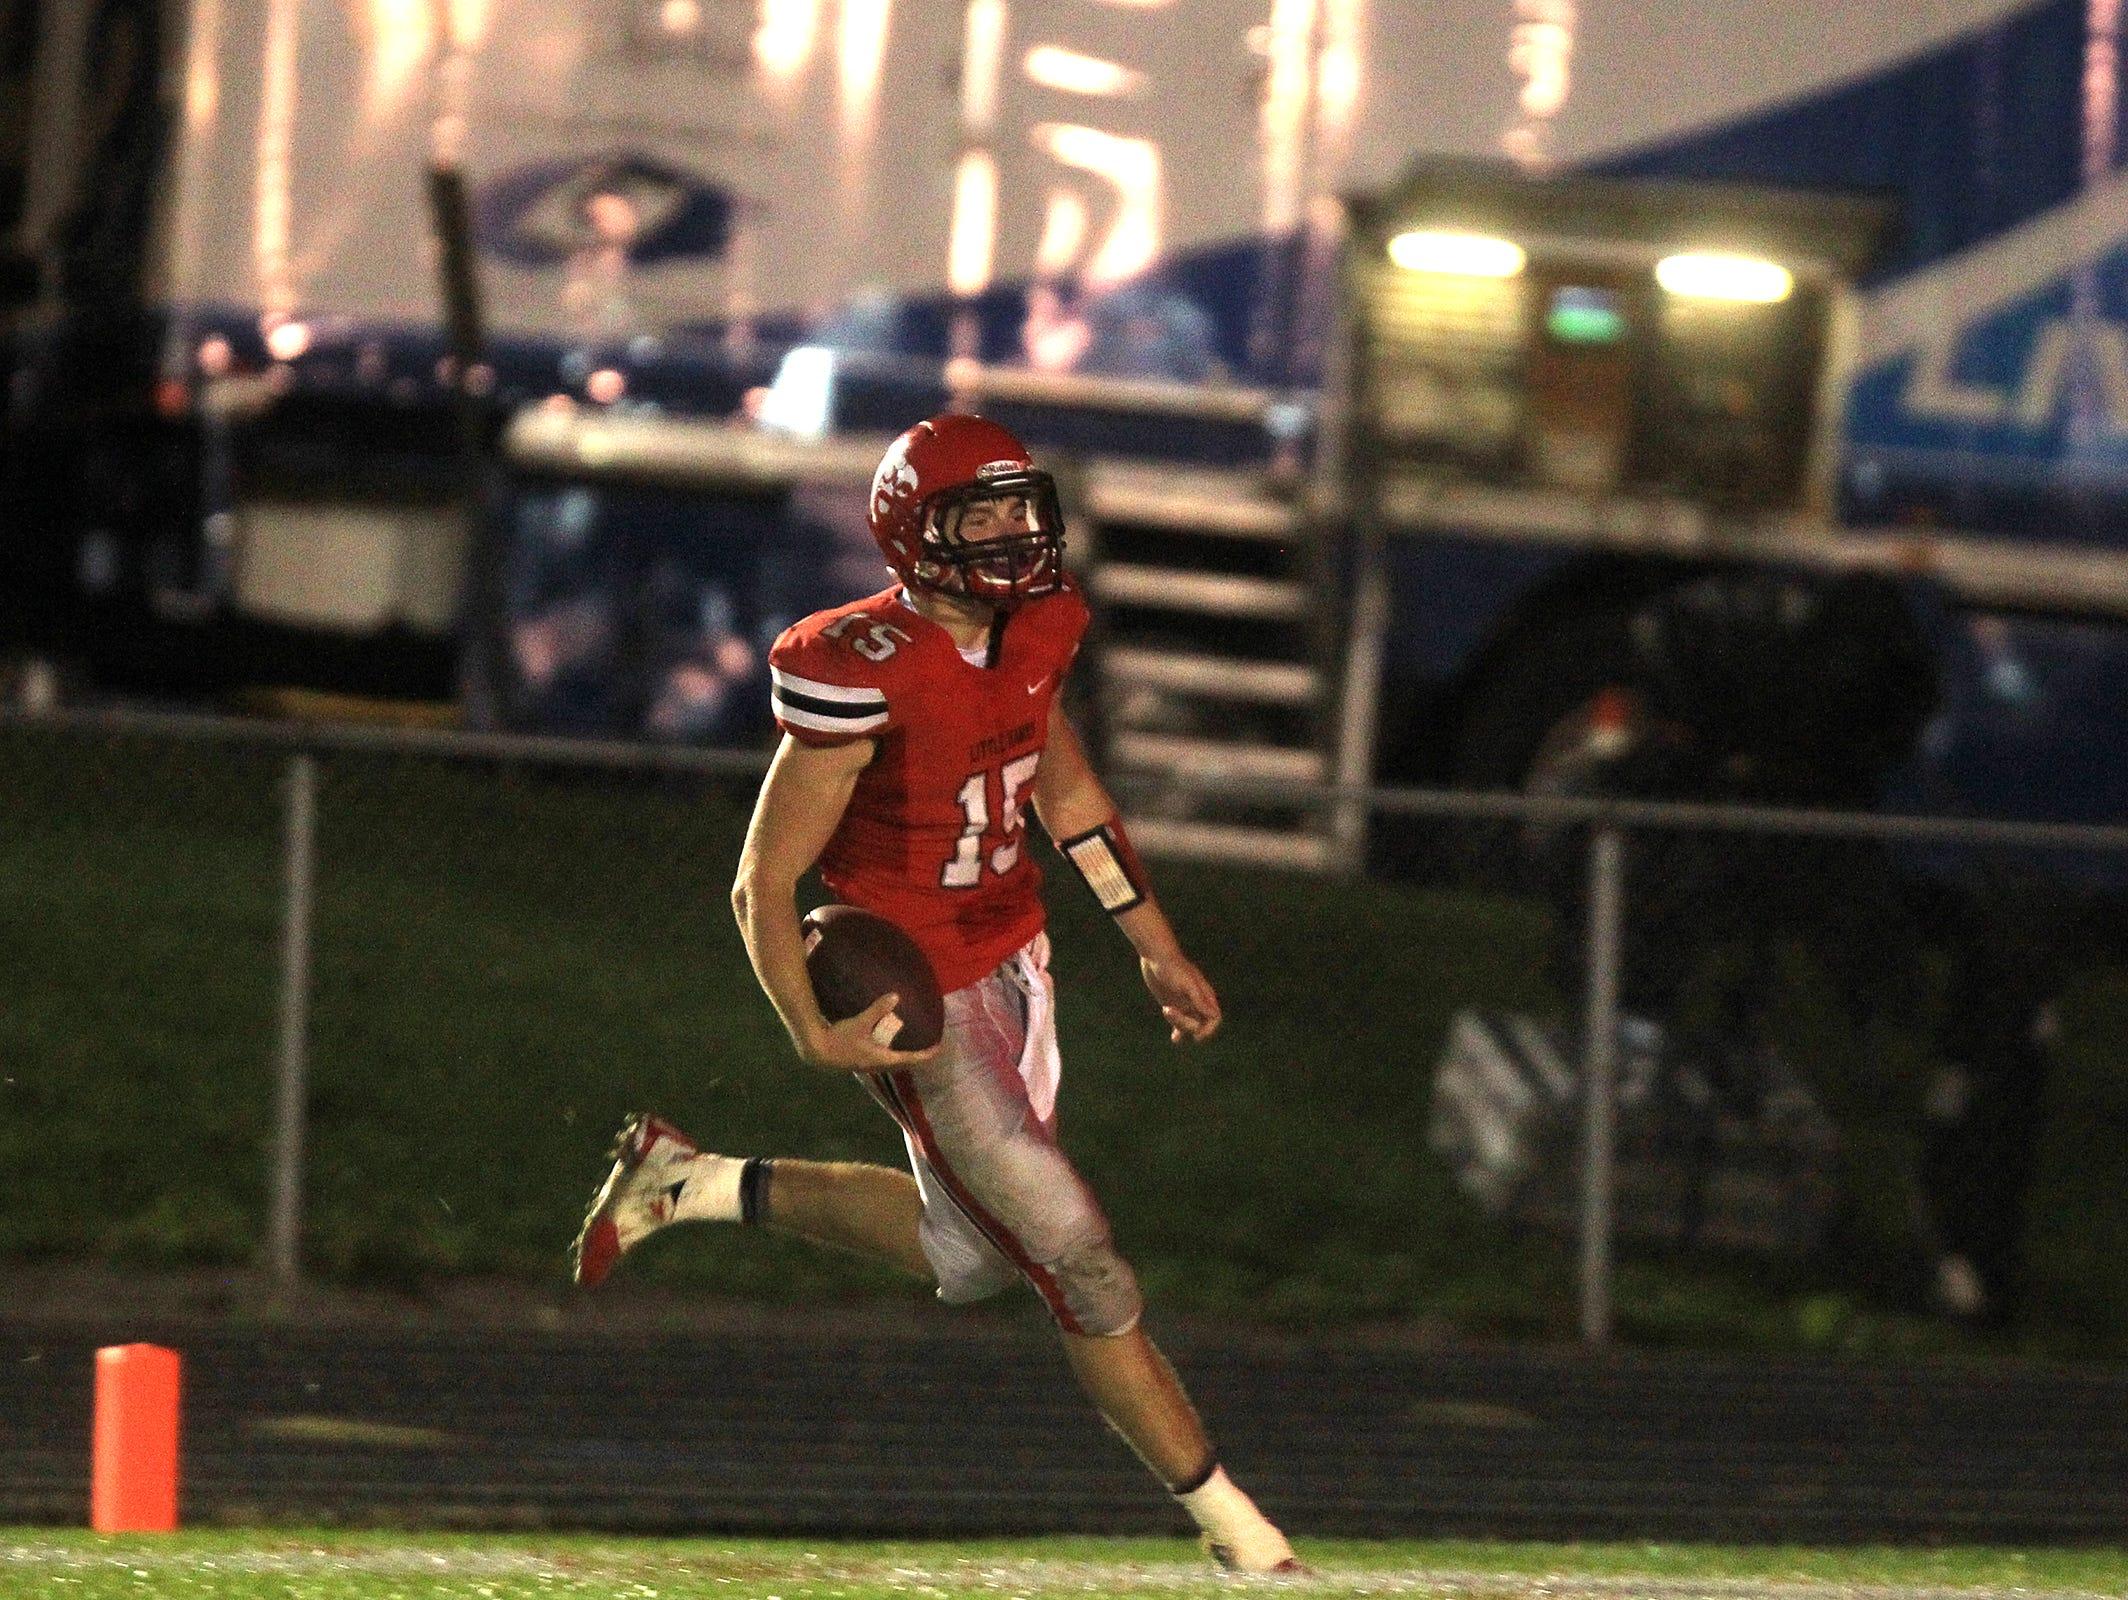 City High quarterback Nate Wieland runs in for a 57-yard touchdown during the Little Hawks' game against Cedar Rapids Prairie at City High on Thursday, Oct. 2, 2014. David Scrivner / Iowa City Press-Citizen